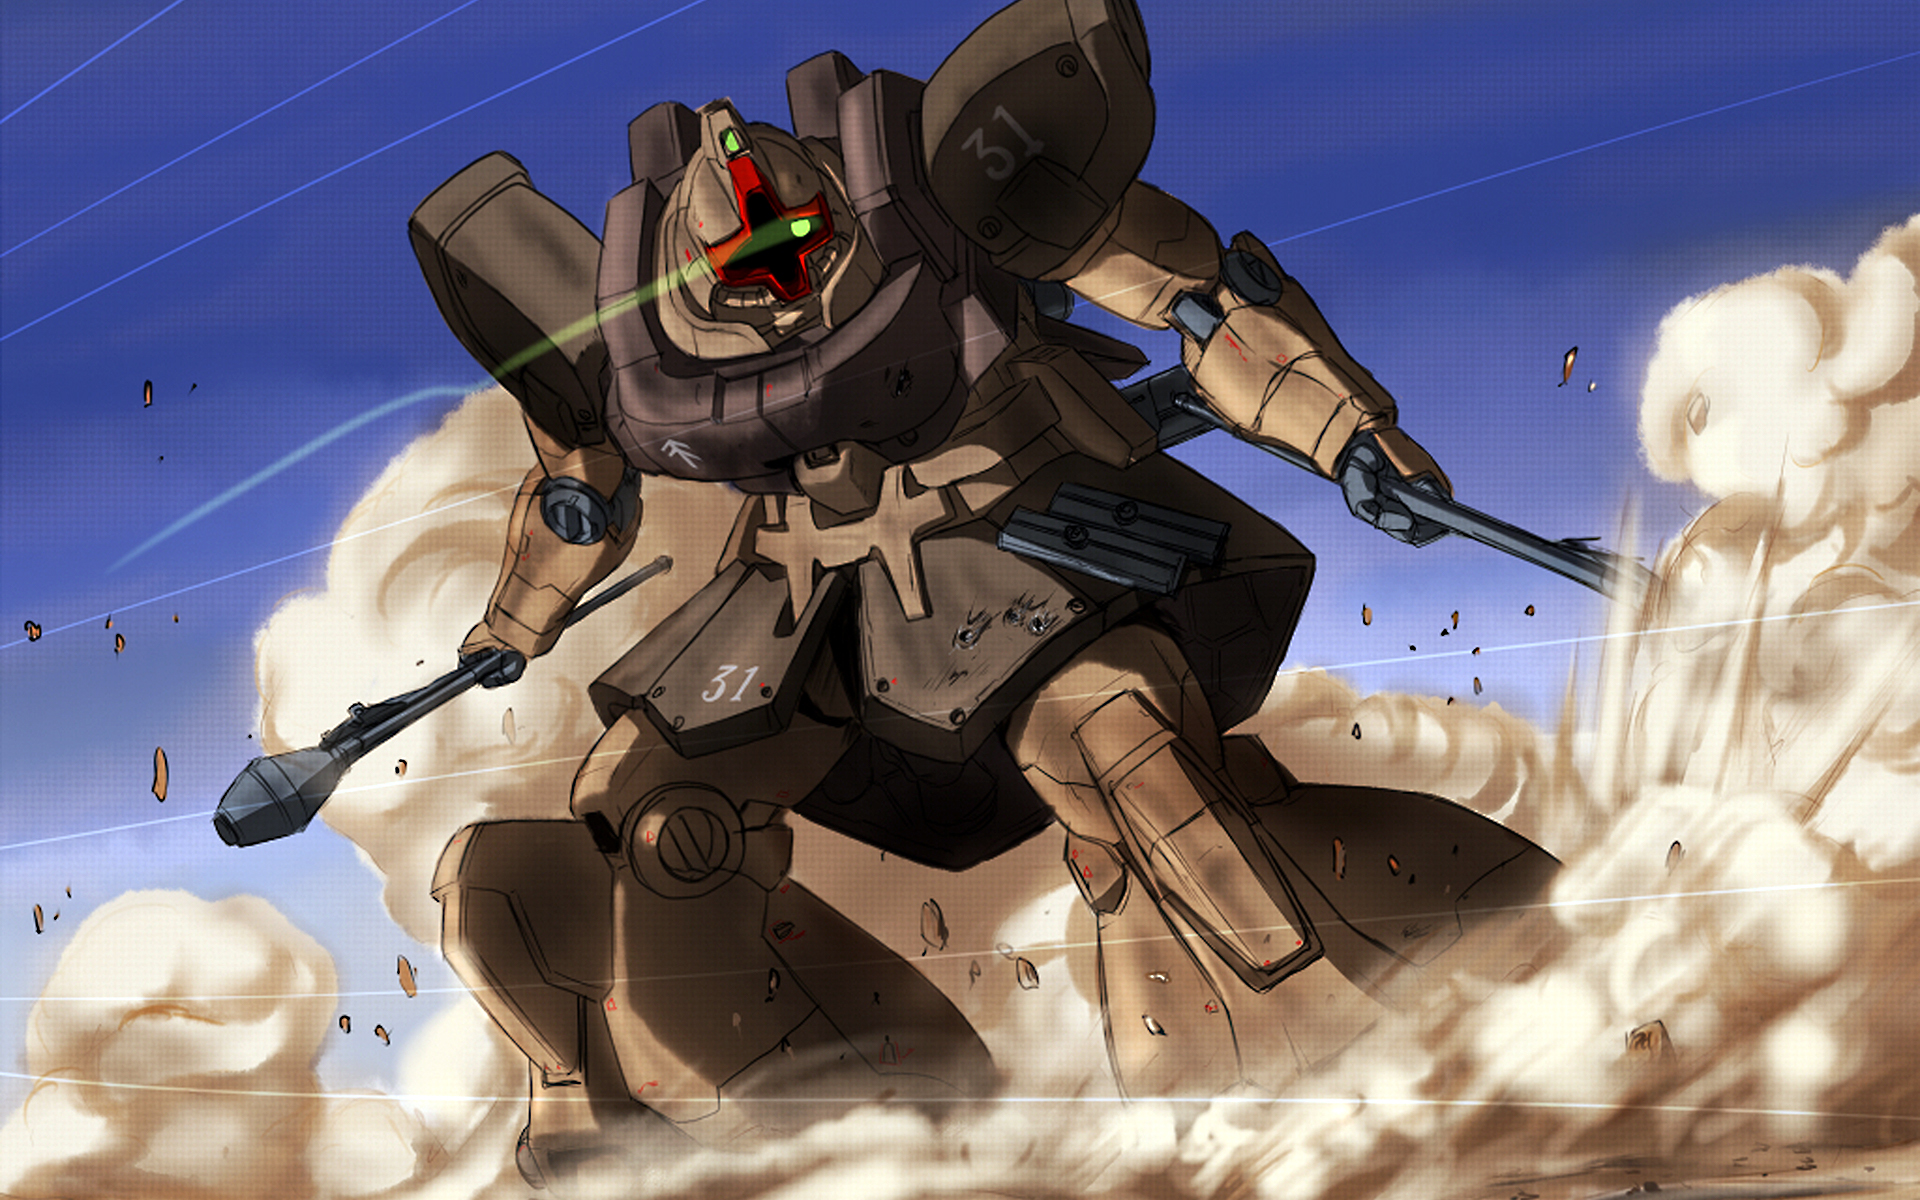 Gundam Dom wallpaper 119650 1920x1200